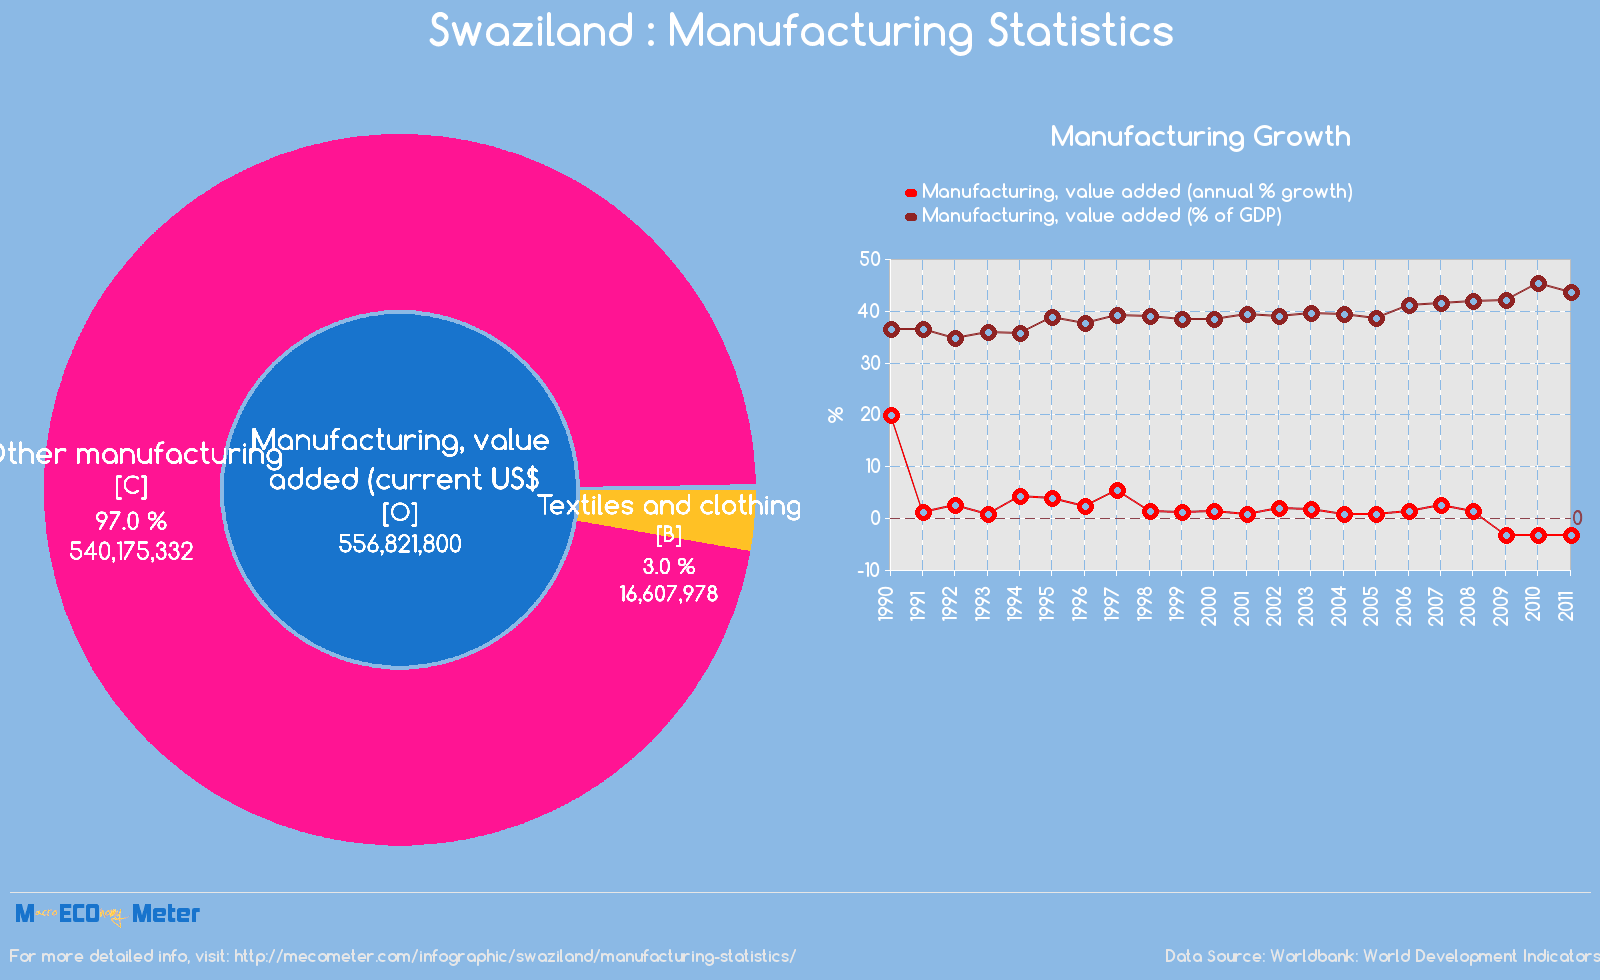 Swaziland : Manufacturing Statistics